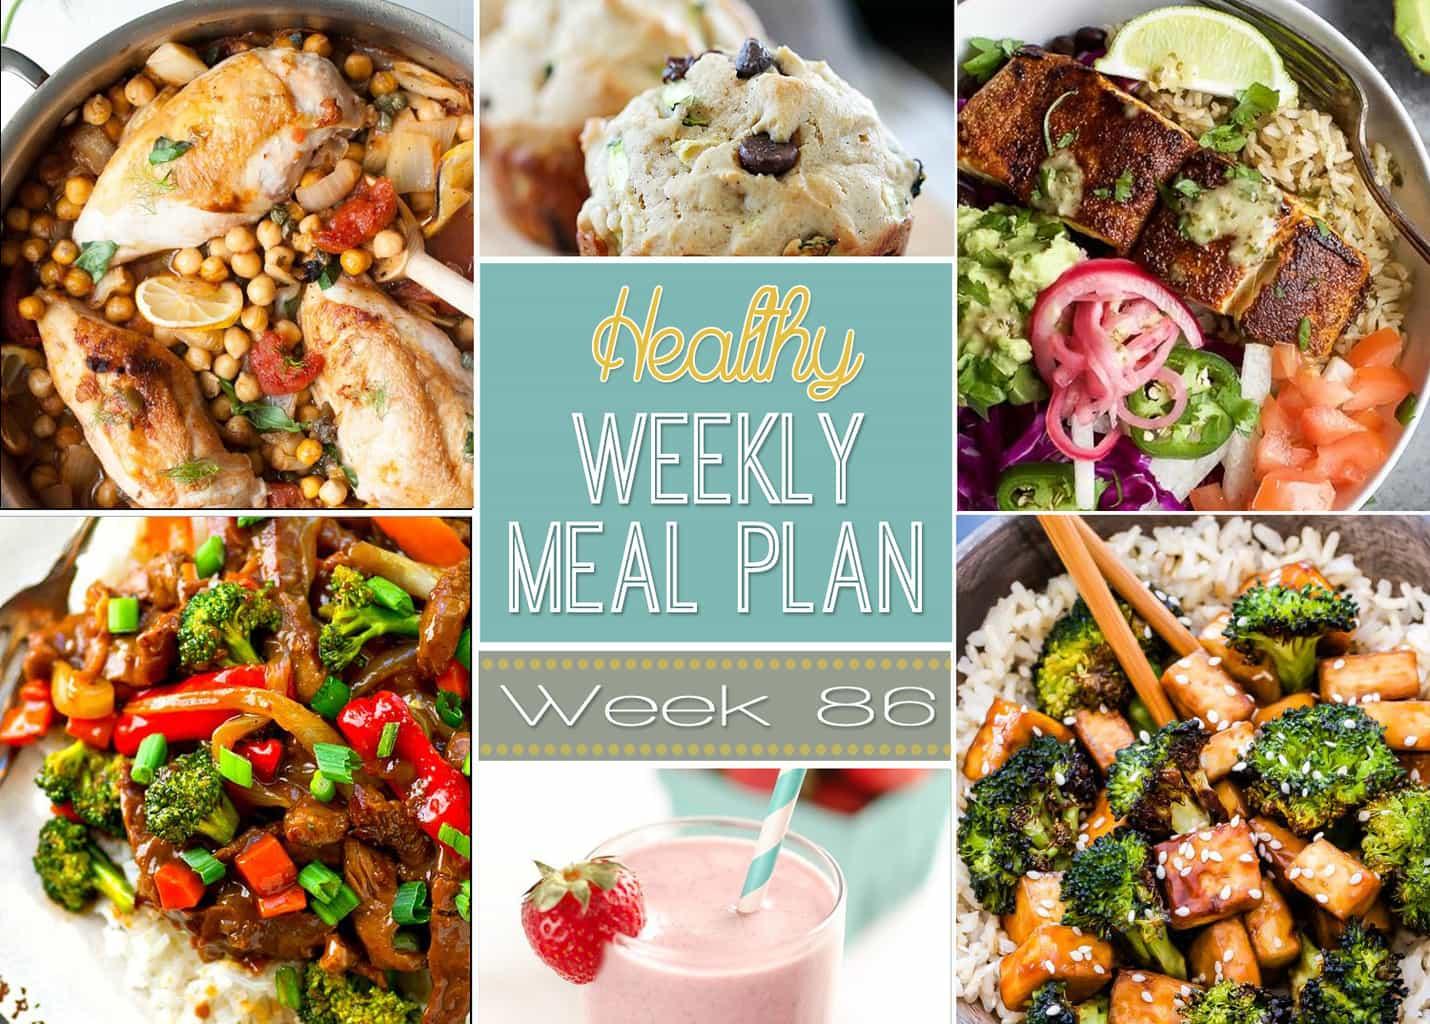 Healthy Weekly Meal Plan 86